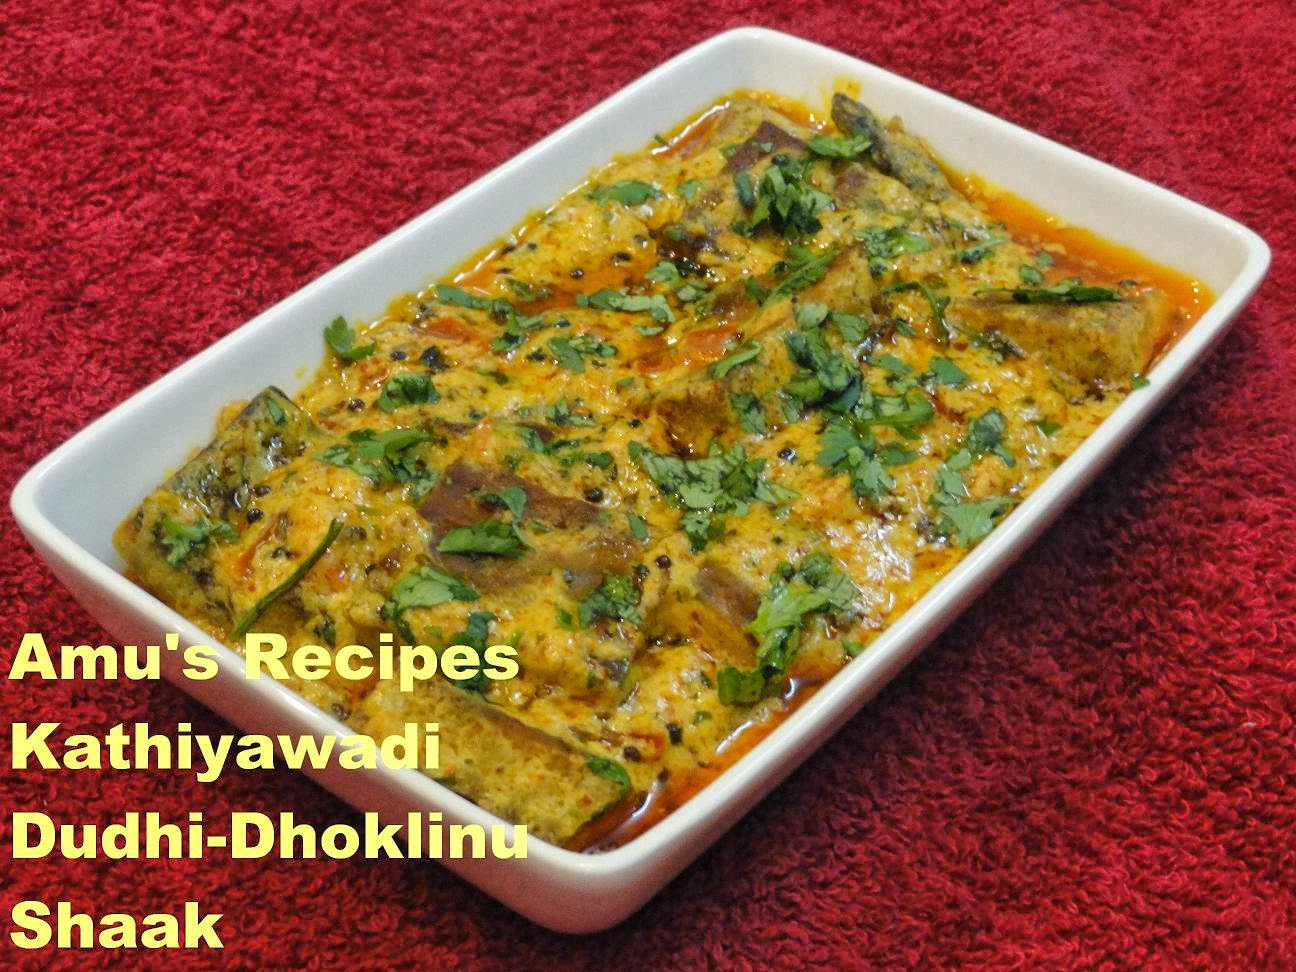 Amus recipes kathiyawadi dudhi dhoklinu shaak forumfinder Choice Image